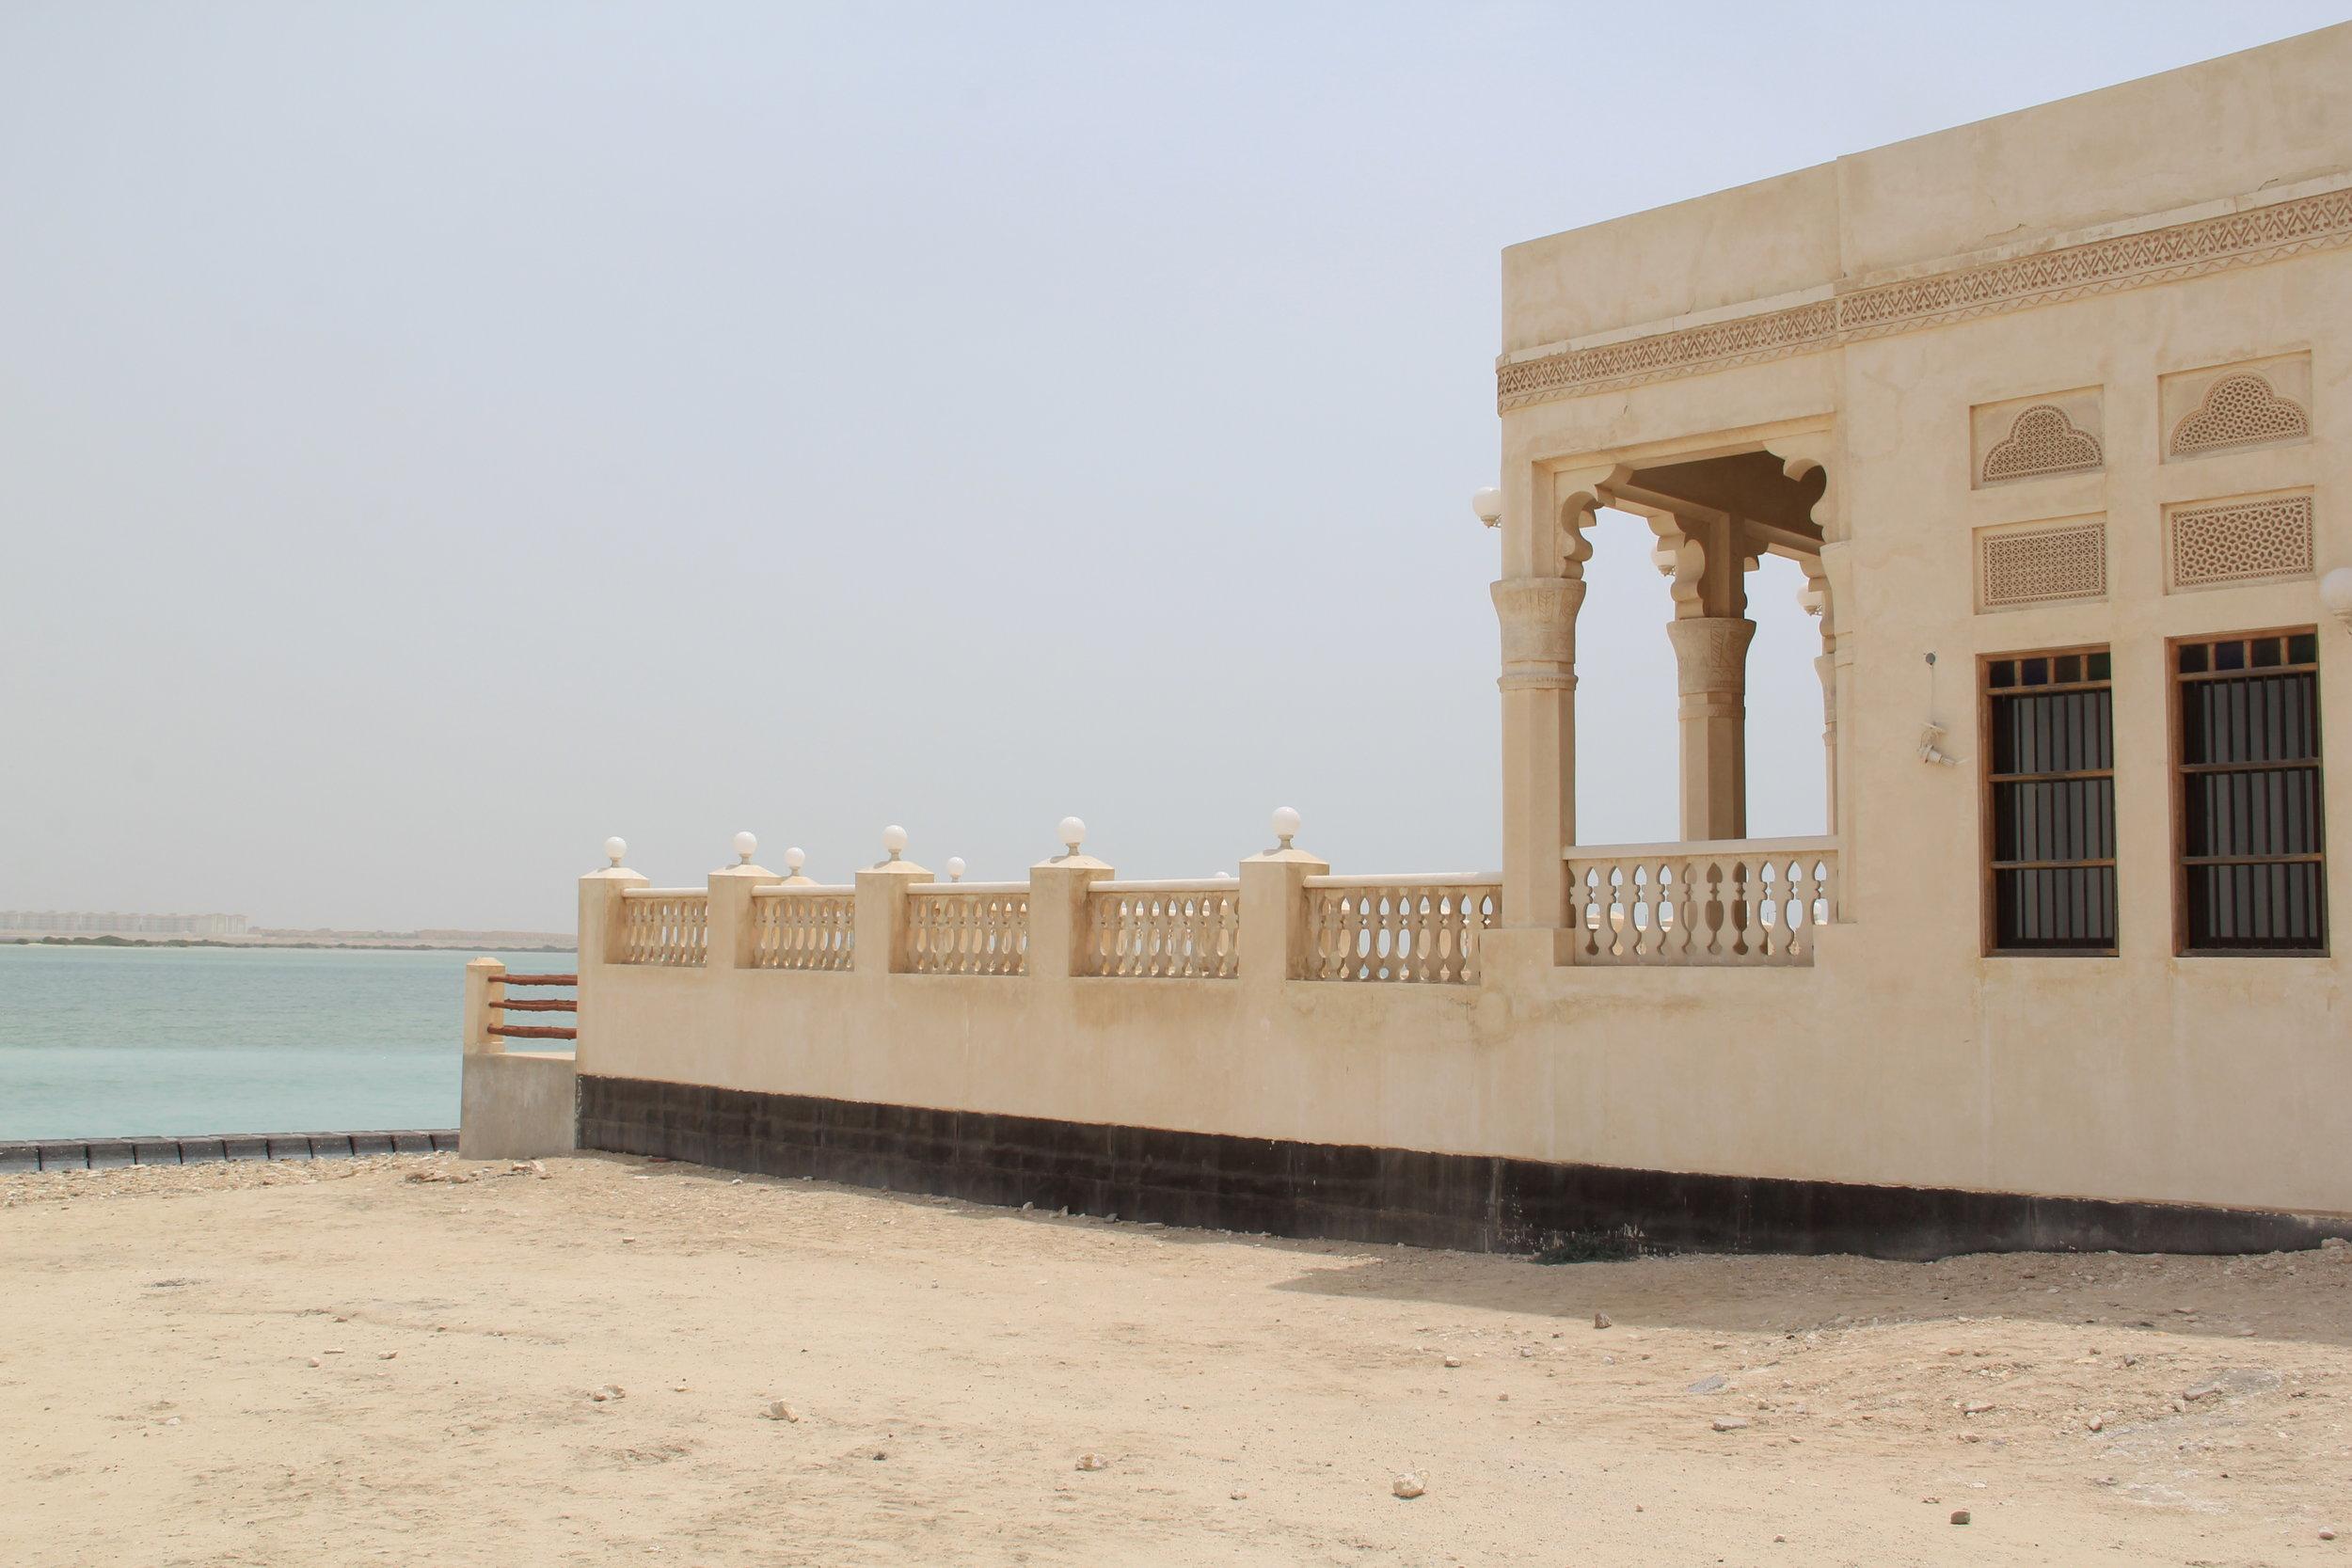 Al Khor Corniche, Al Khor, Qatar. Taken by Tyanna LC